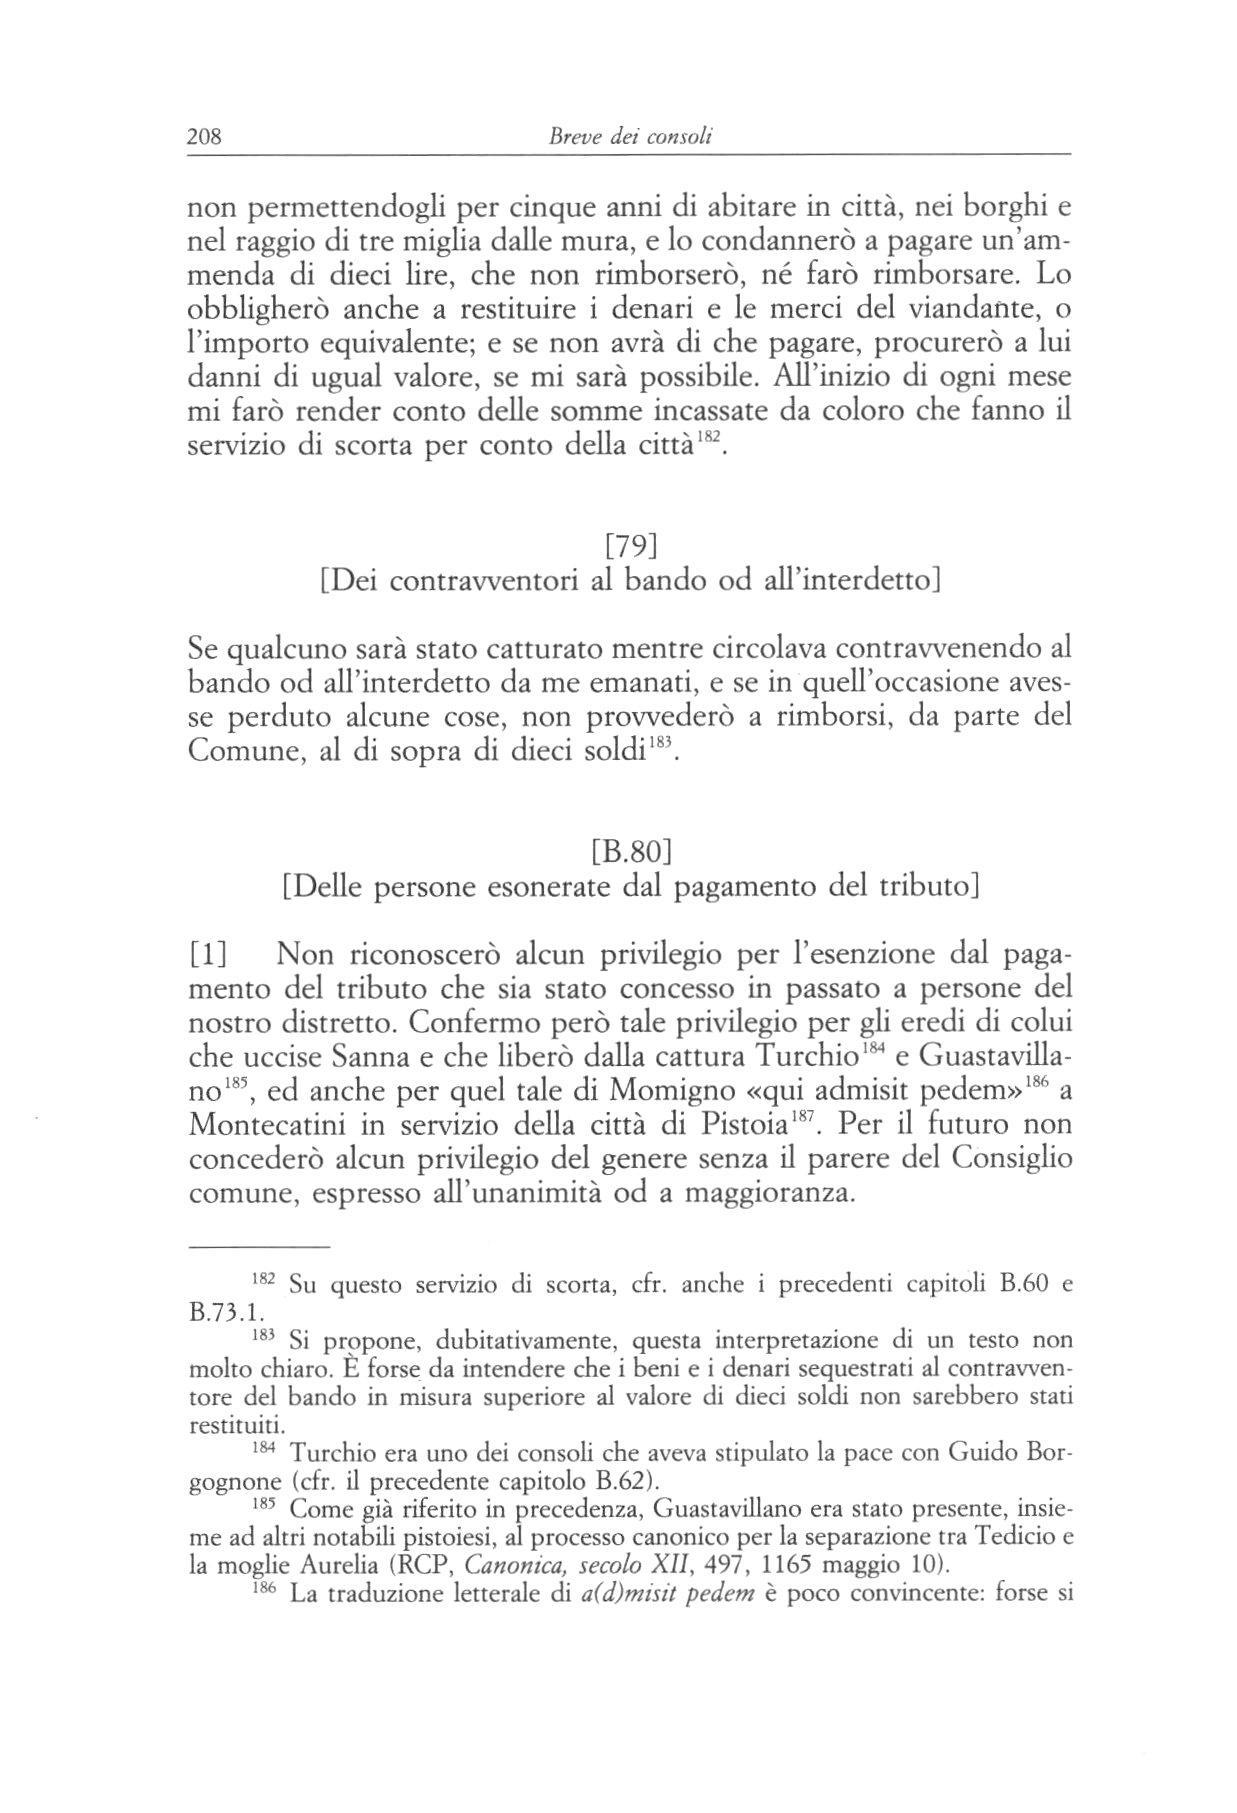 statuti pistoiesi del sec.XII 0208.jpg